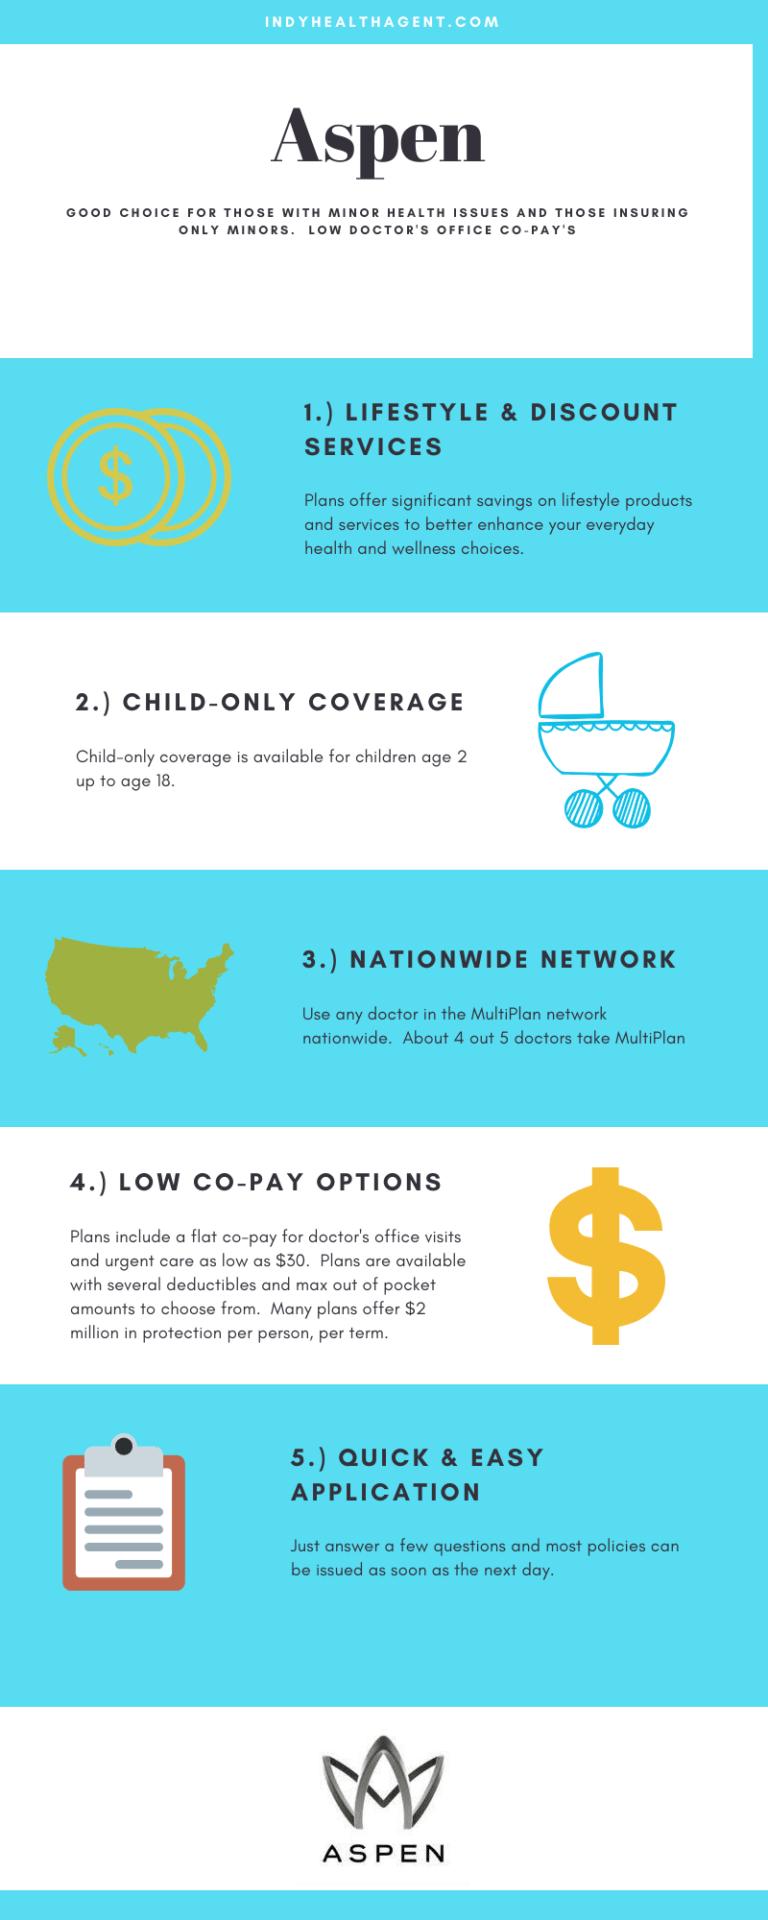 Aspen Health Insurance Information